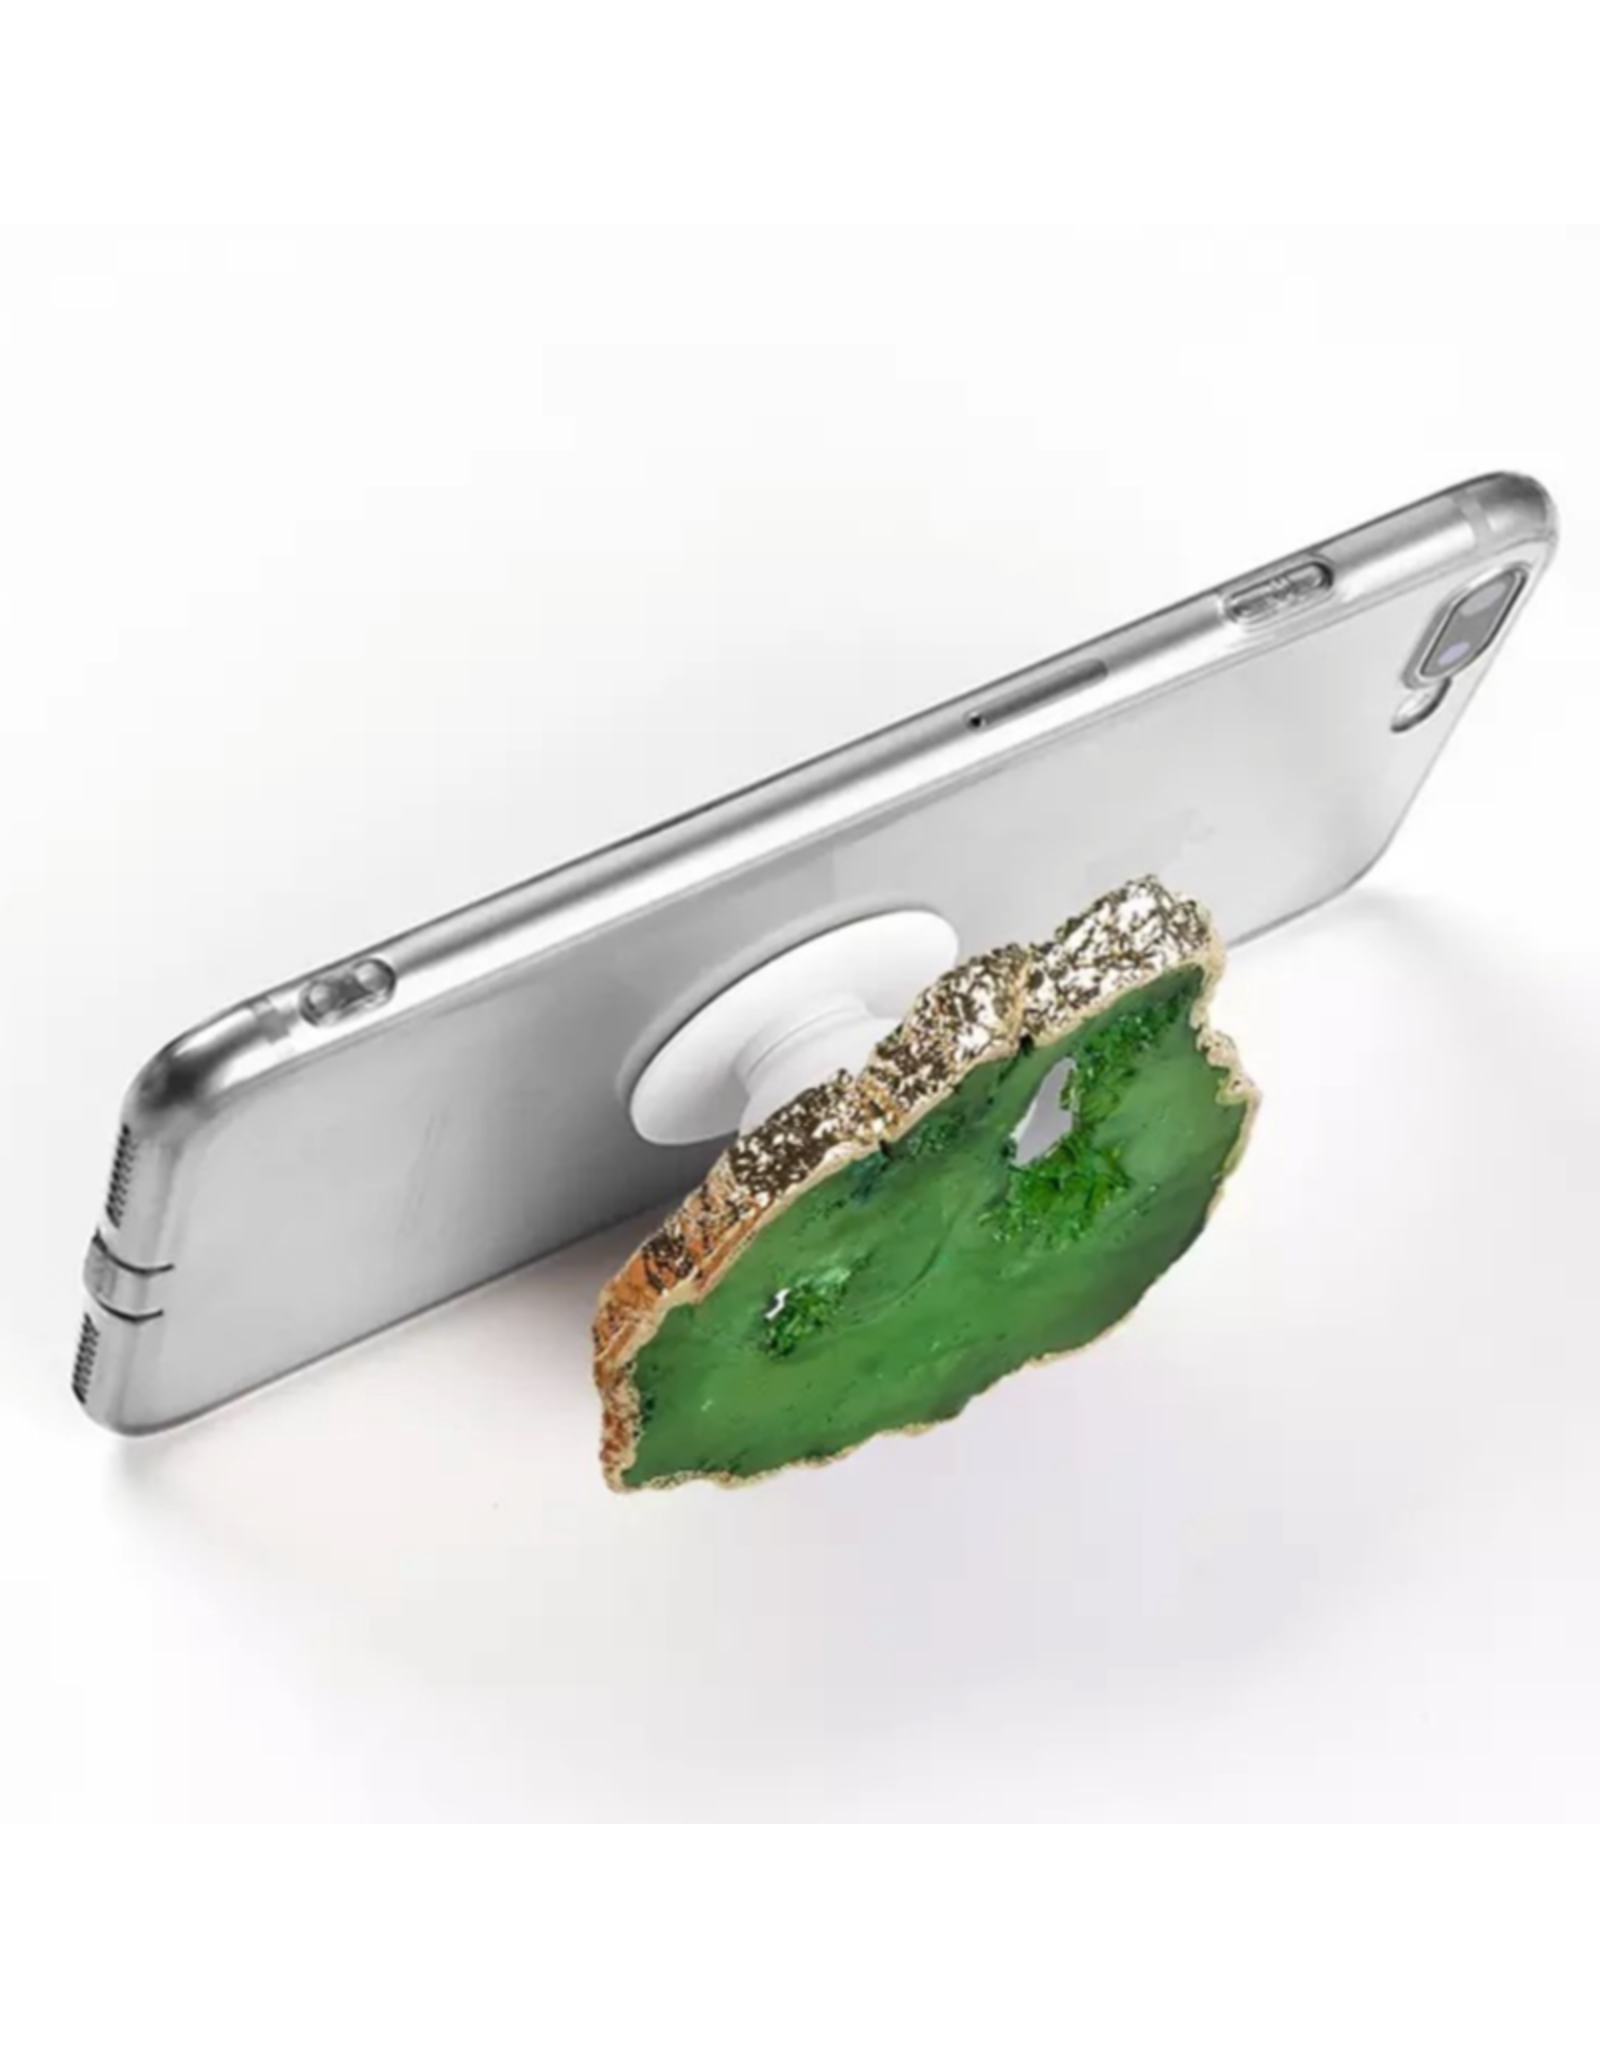 Natural Stone Phone Grip